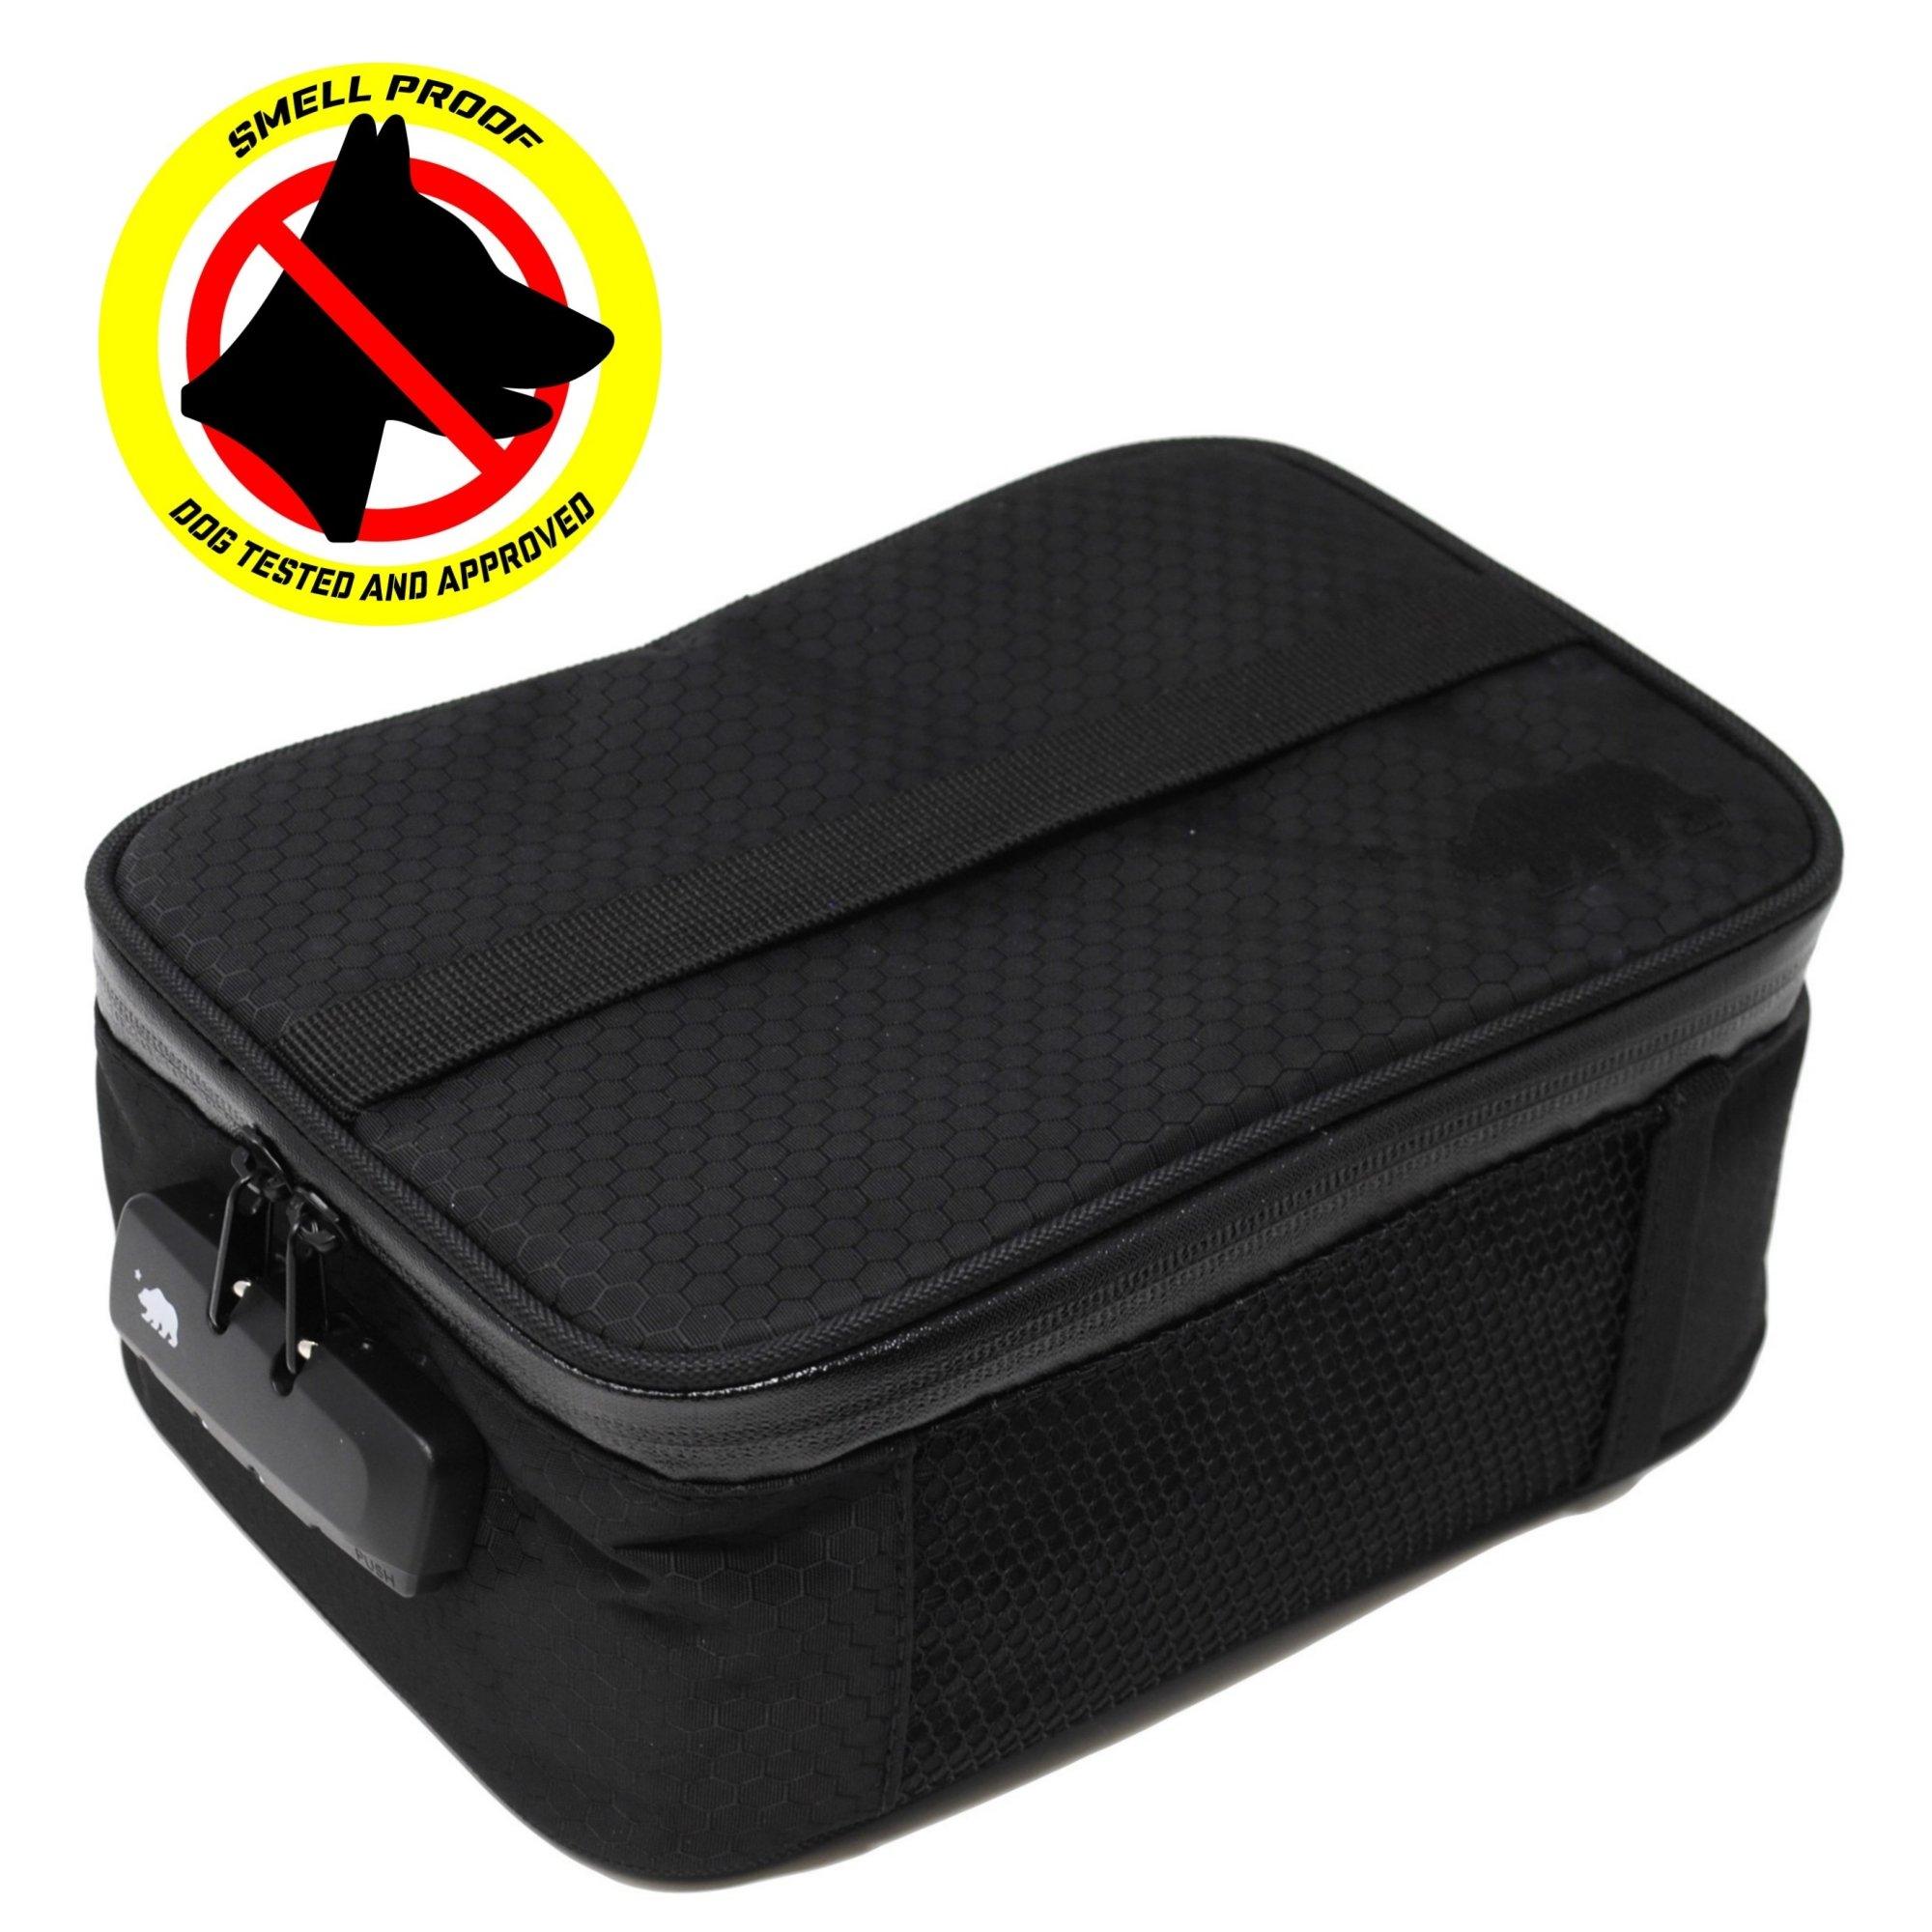 Cali Crusher 100% Smell Proof Soft Case w/Combo Lock (9in x 7in x 3.5in) (Black)